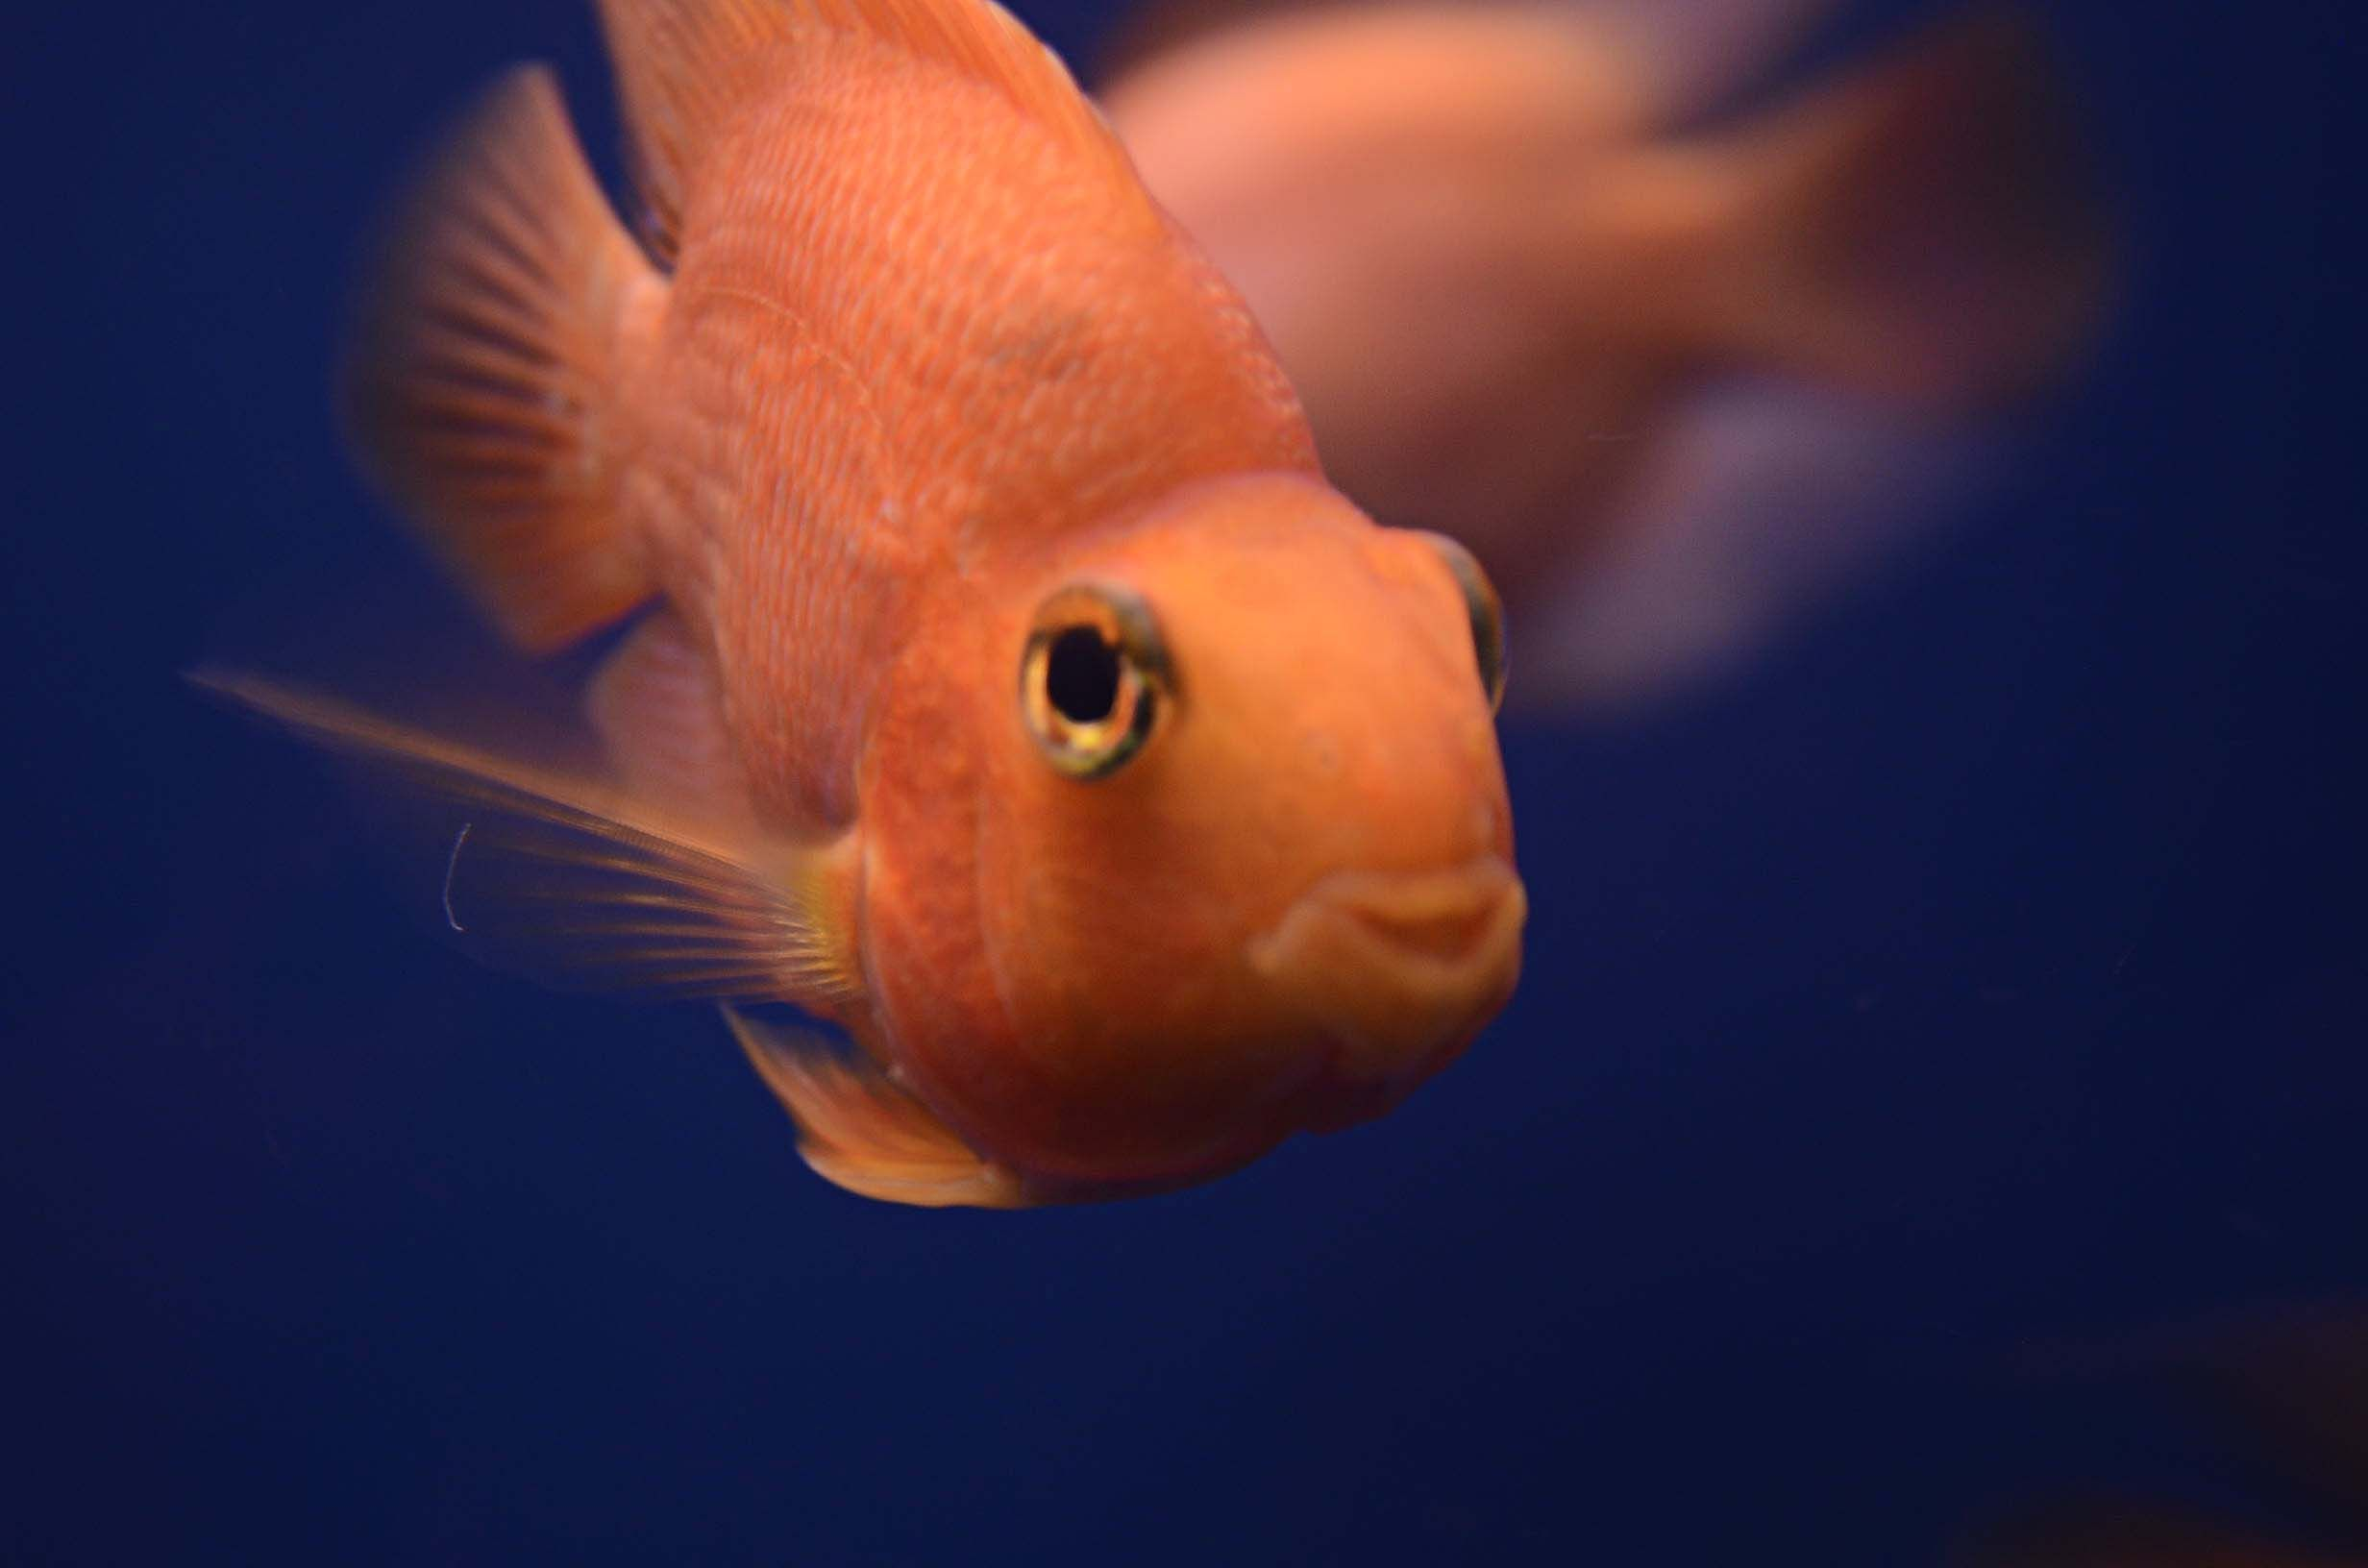 Aun teniendo un segundo se logran grandes cosas. #Photography #Fish #Zoo #Fotografia